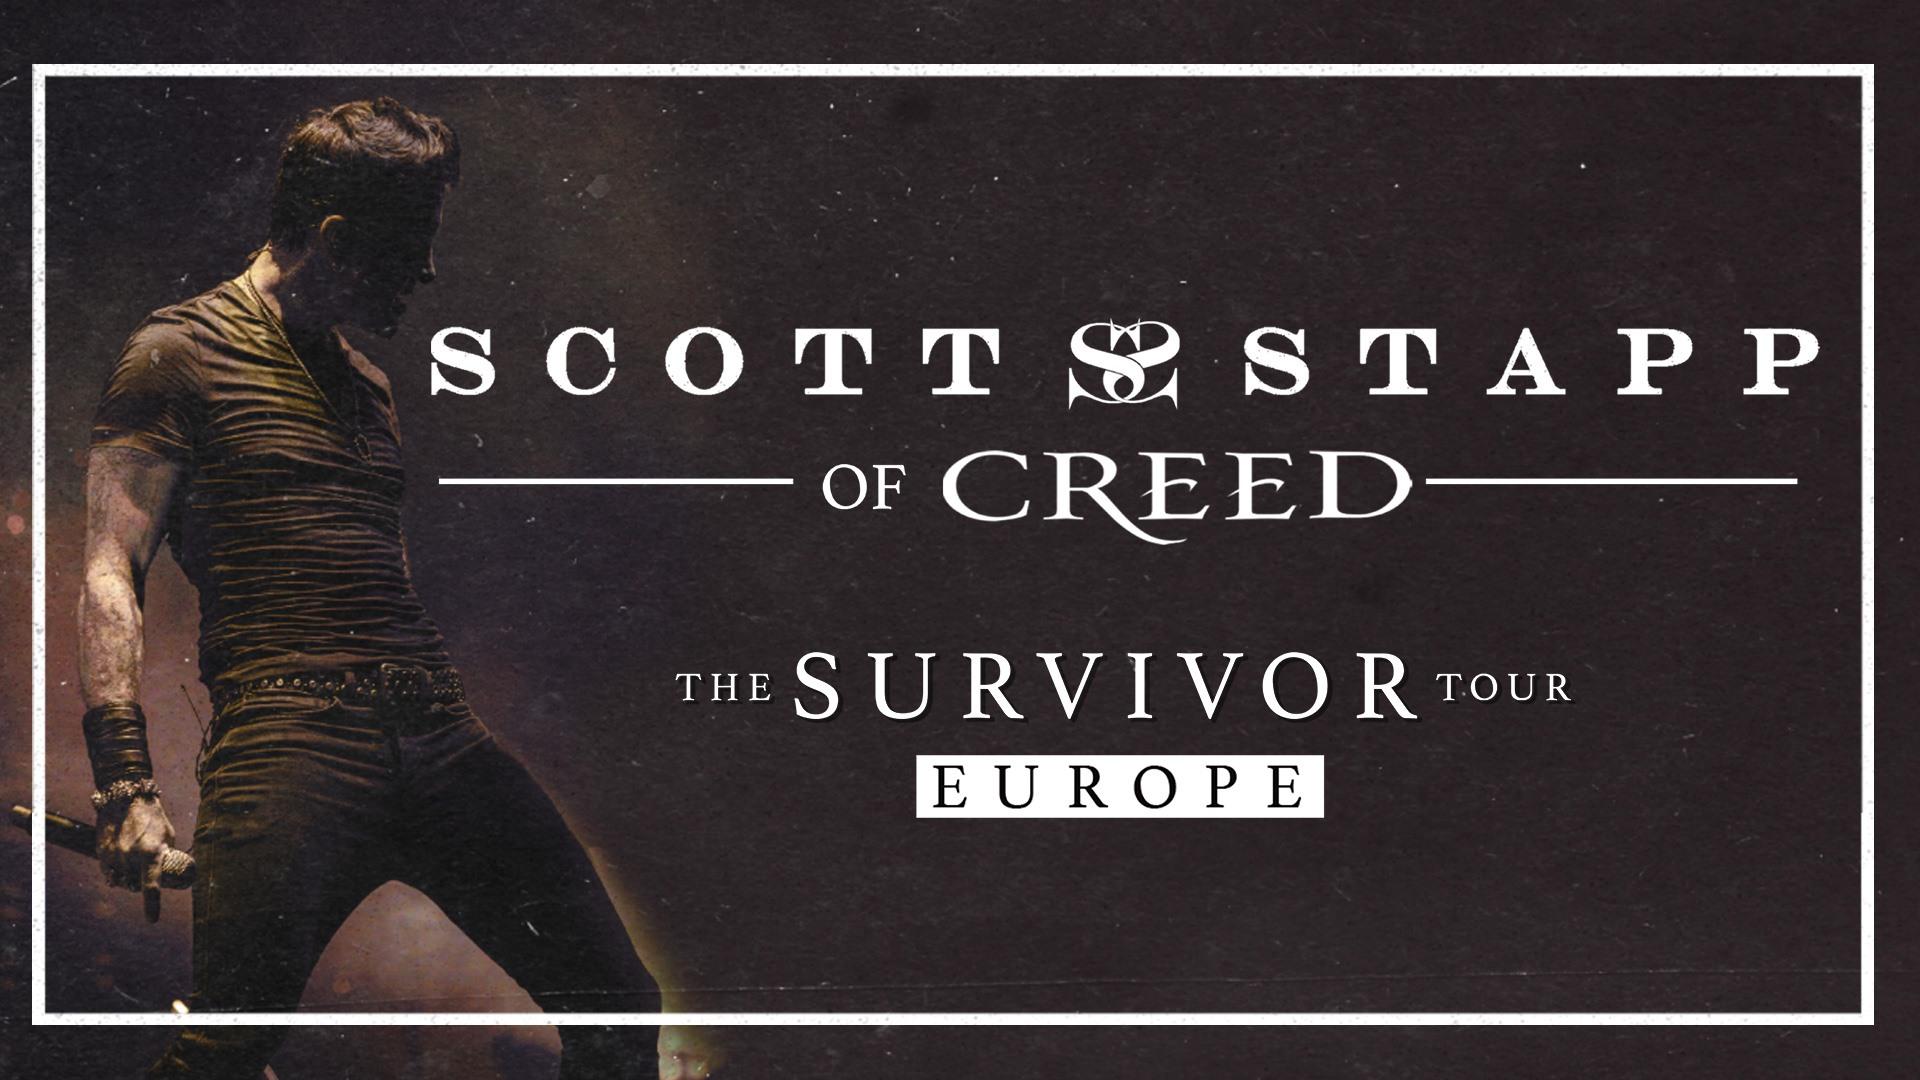 Scott Stapp (of Creed) am 8. November 2020 @ Szene Wien.